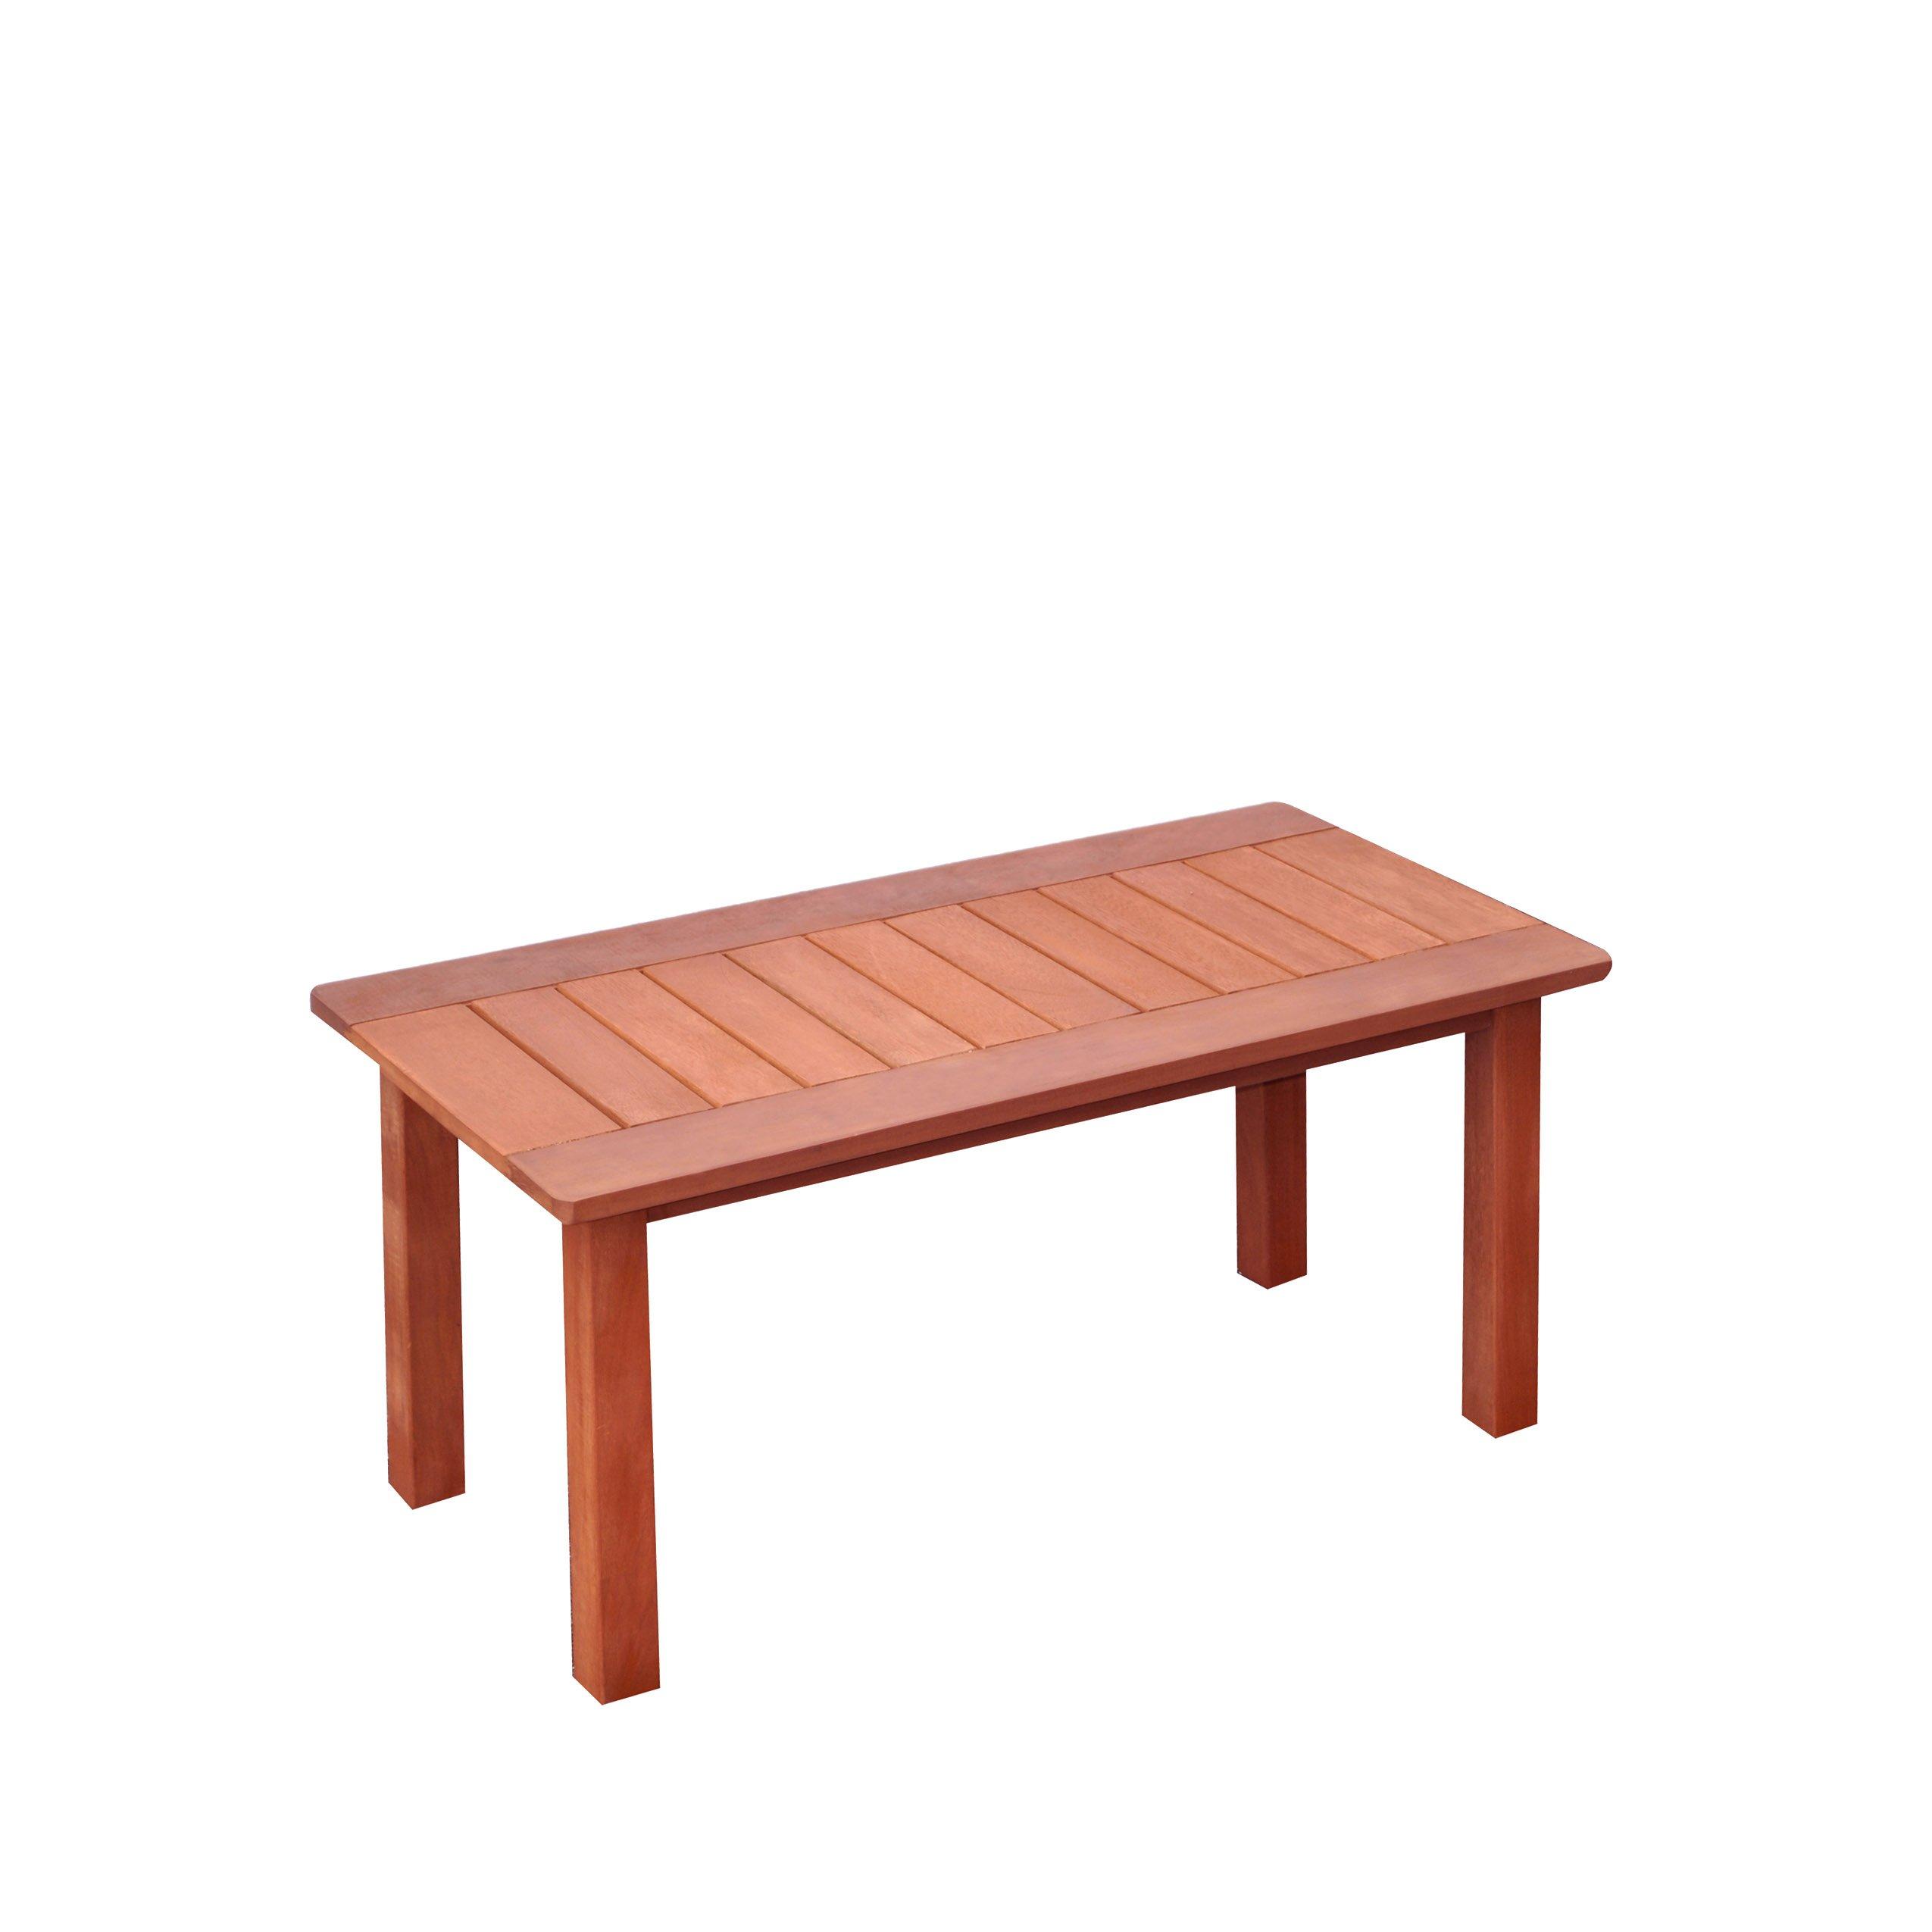 CorLiving PEX-868-T Miramar Hardwood Outdoor Coffee Table, Cinnamon Brown